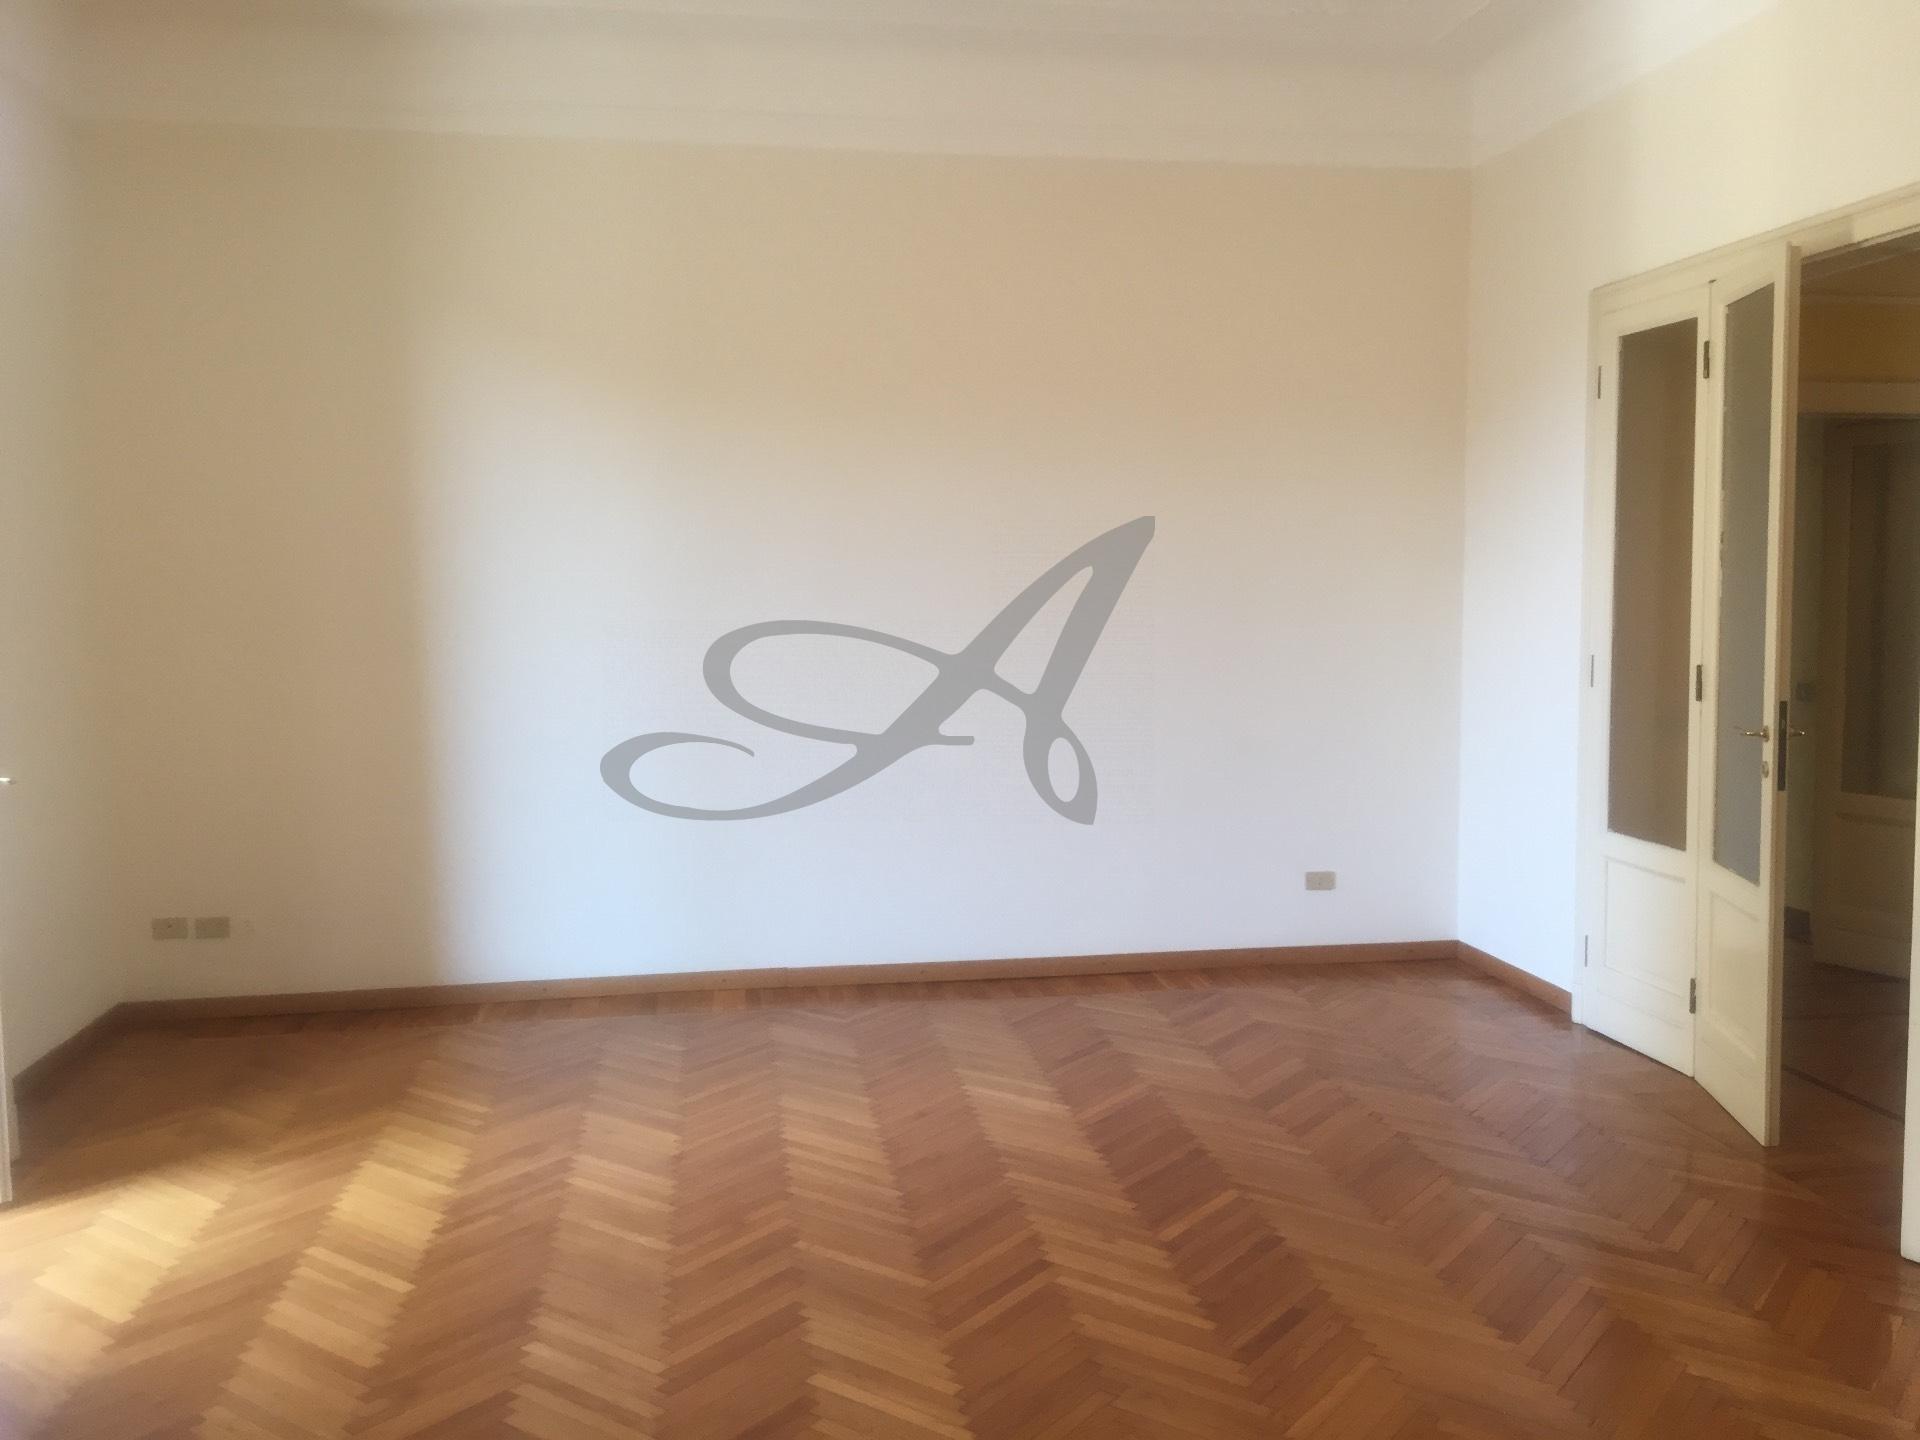 Milano | Appartamento in Affitto in Largo Del Carrobbio | lacasadimilano.it